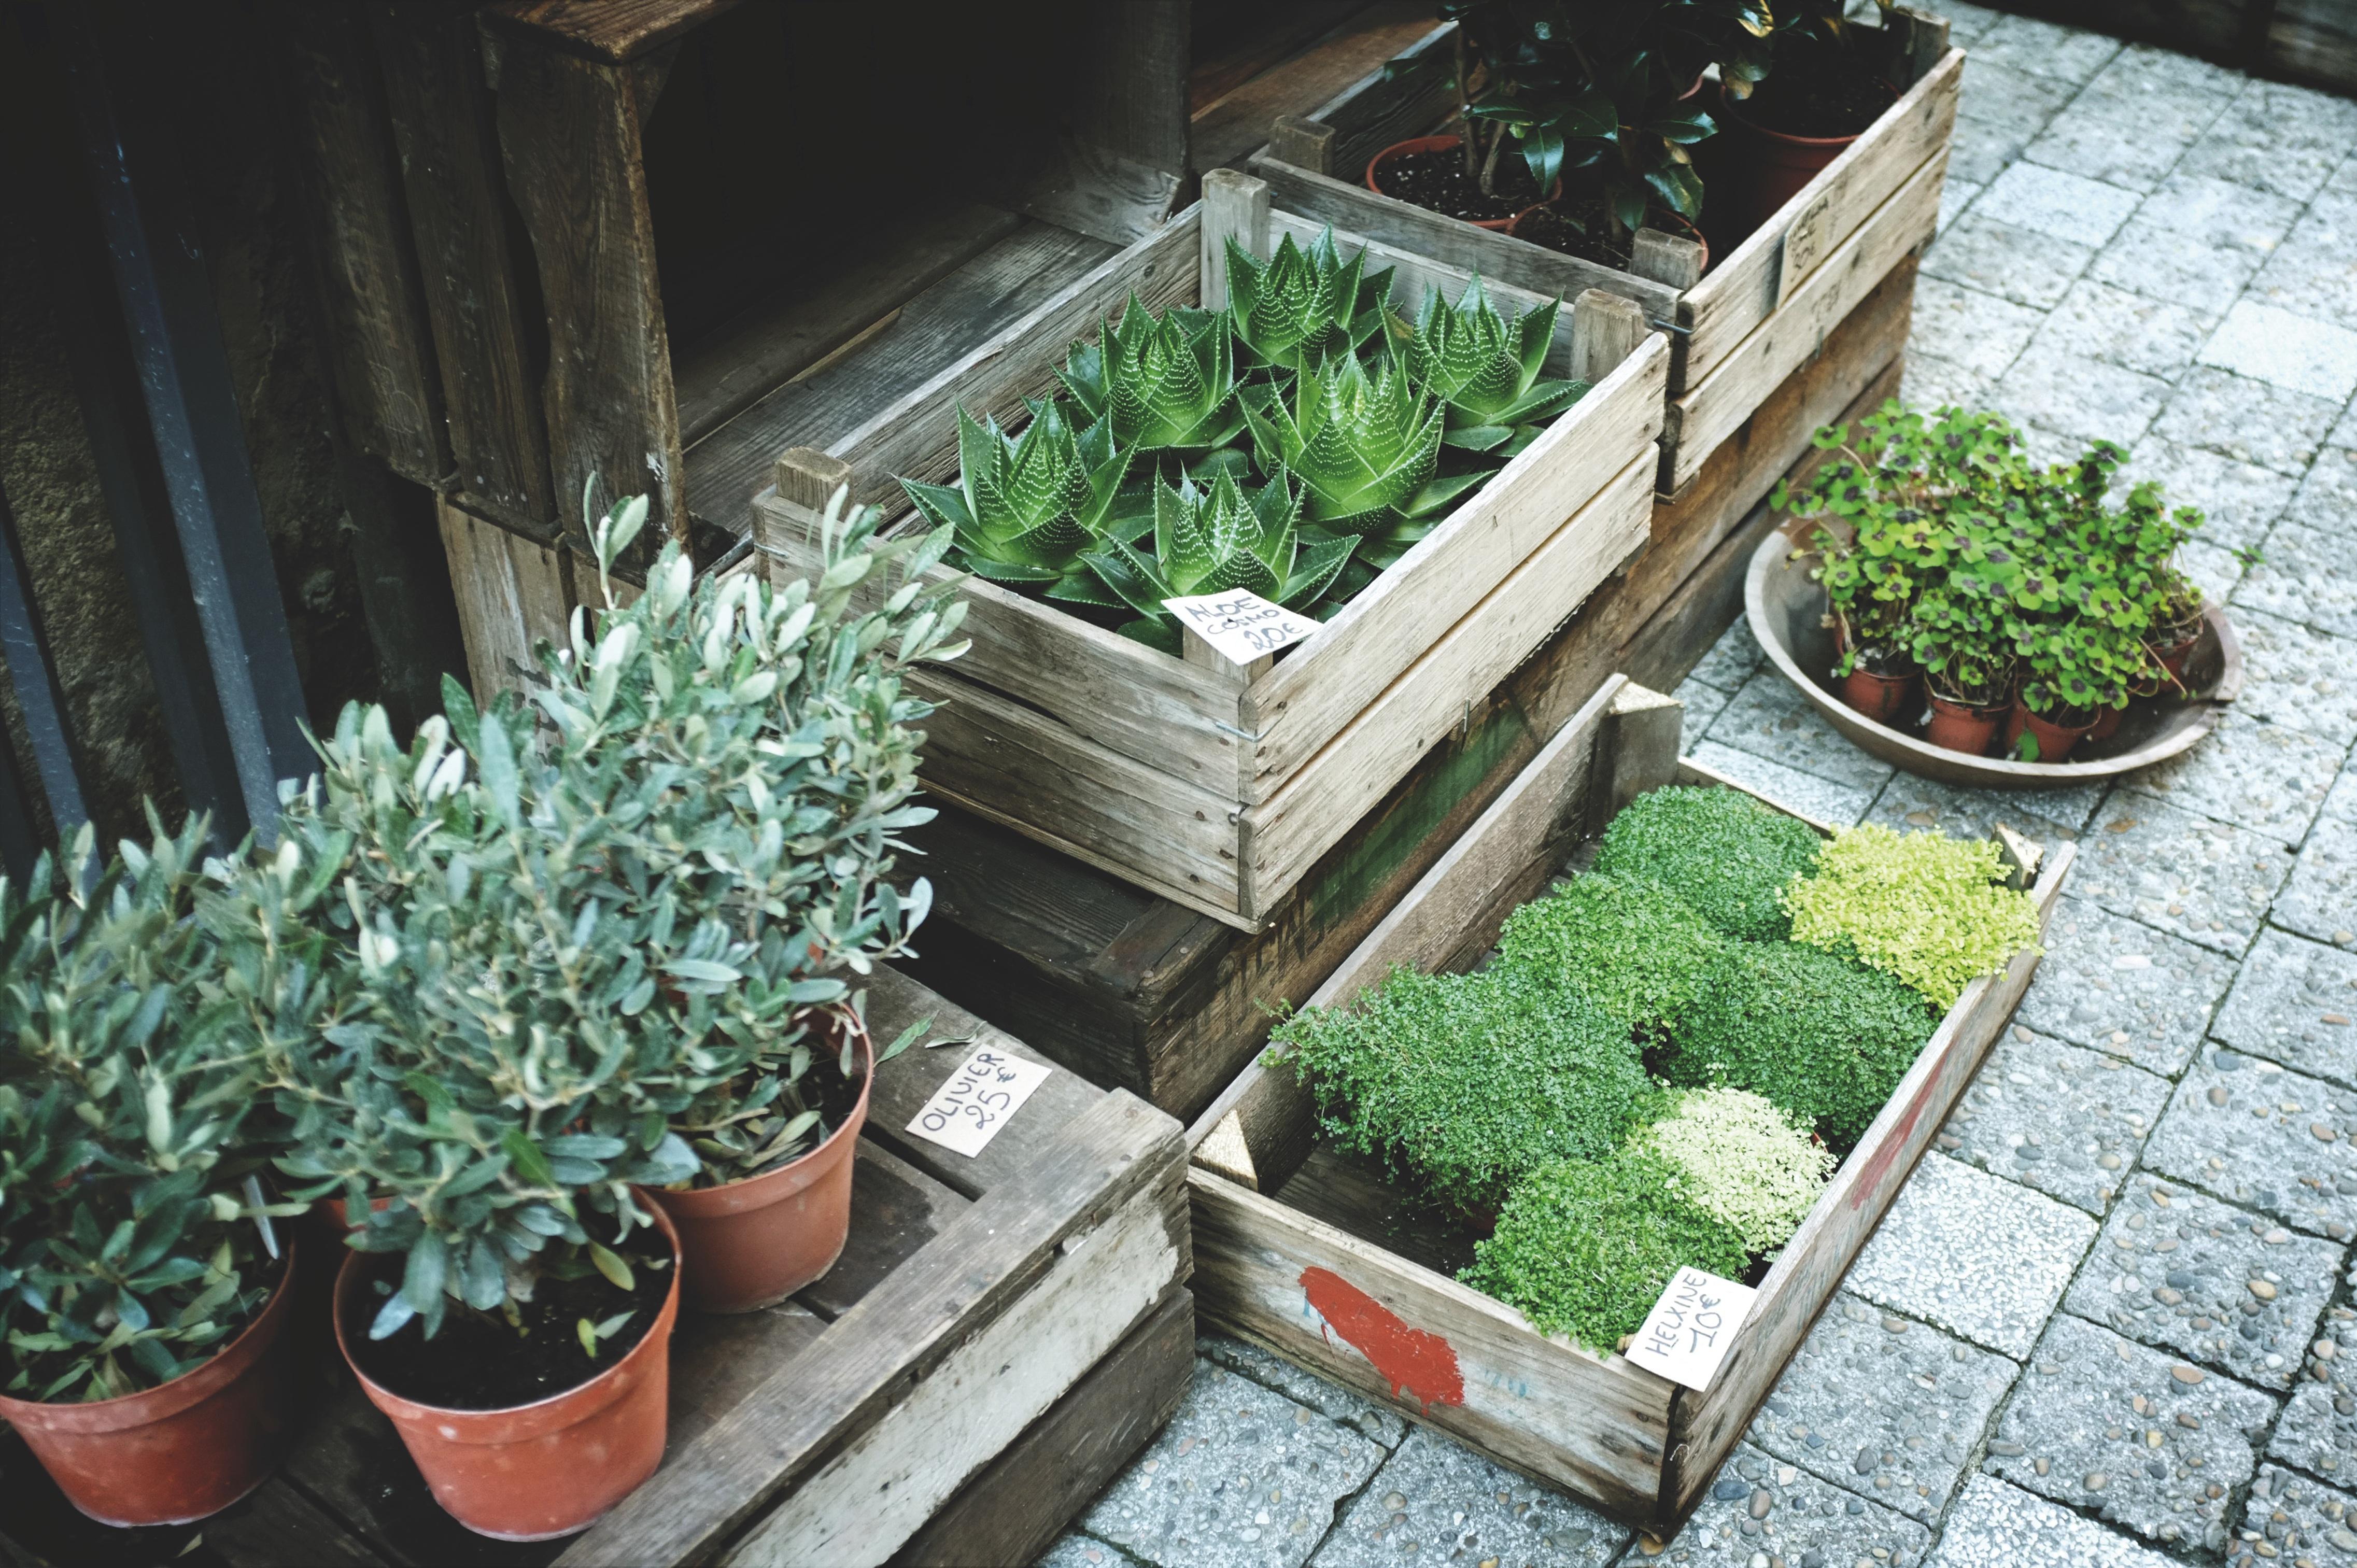 Free Images : sidewalk, flower, pot, herb, produce ...